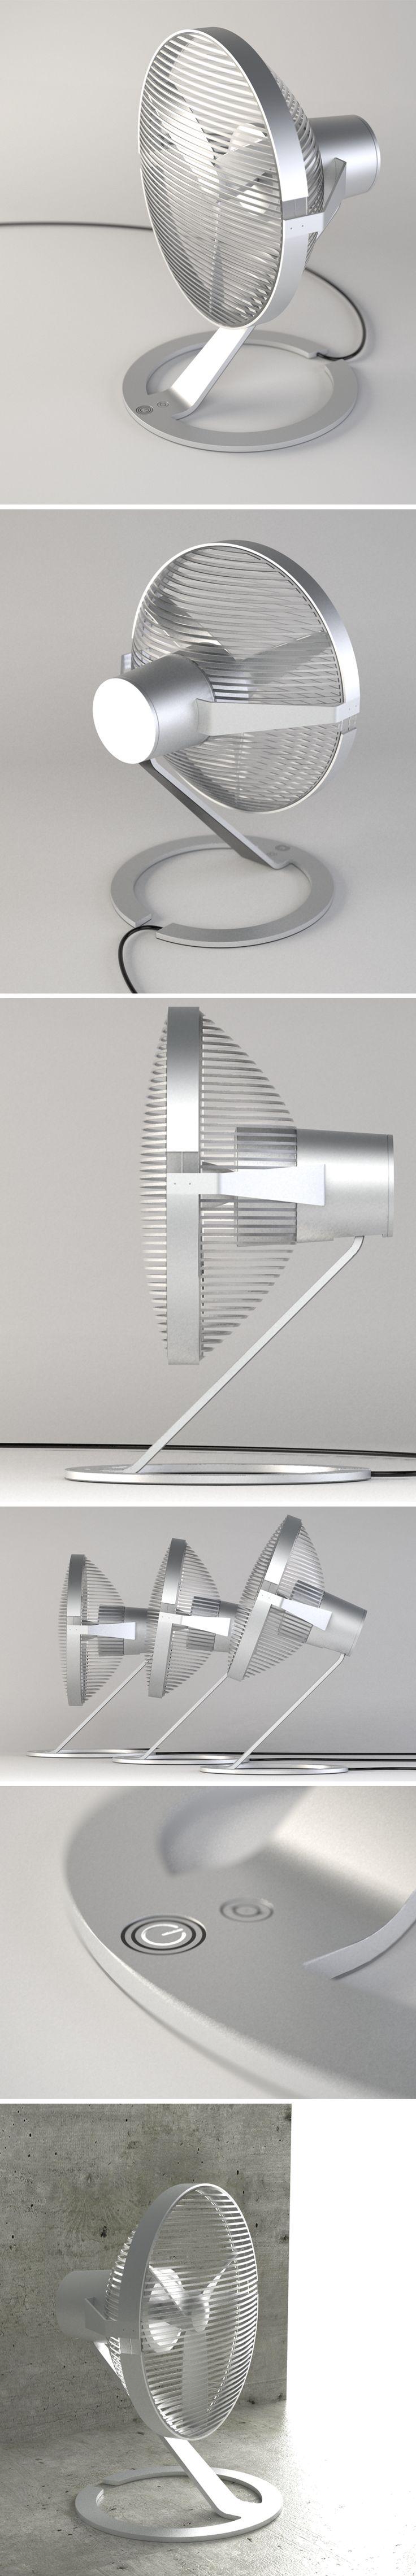 Sweet fan design by : http://www.rationalistdesign.com/